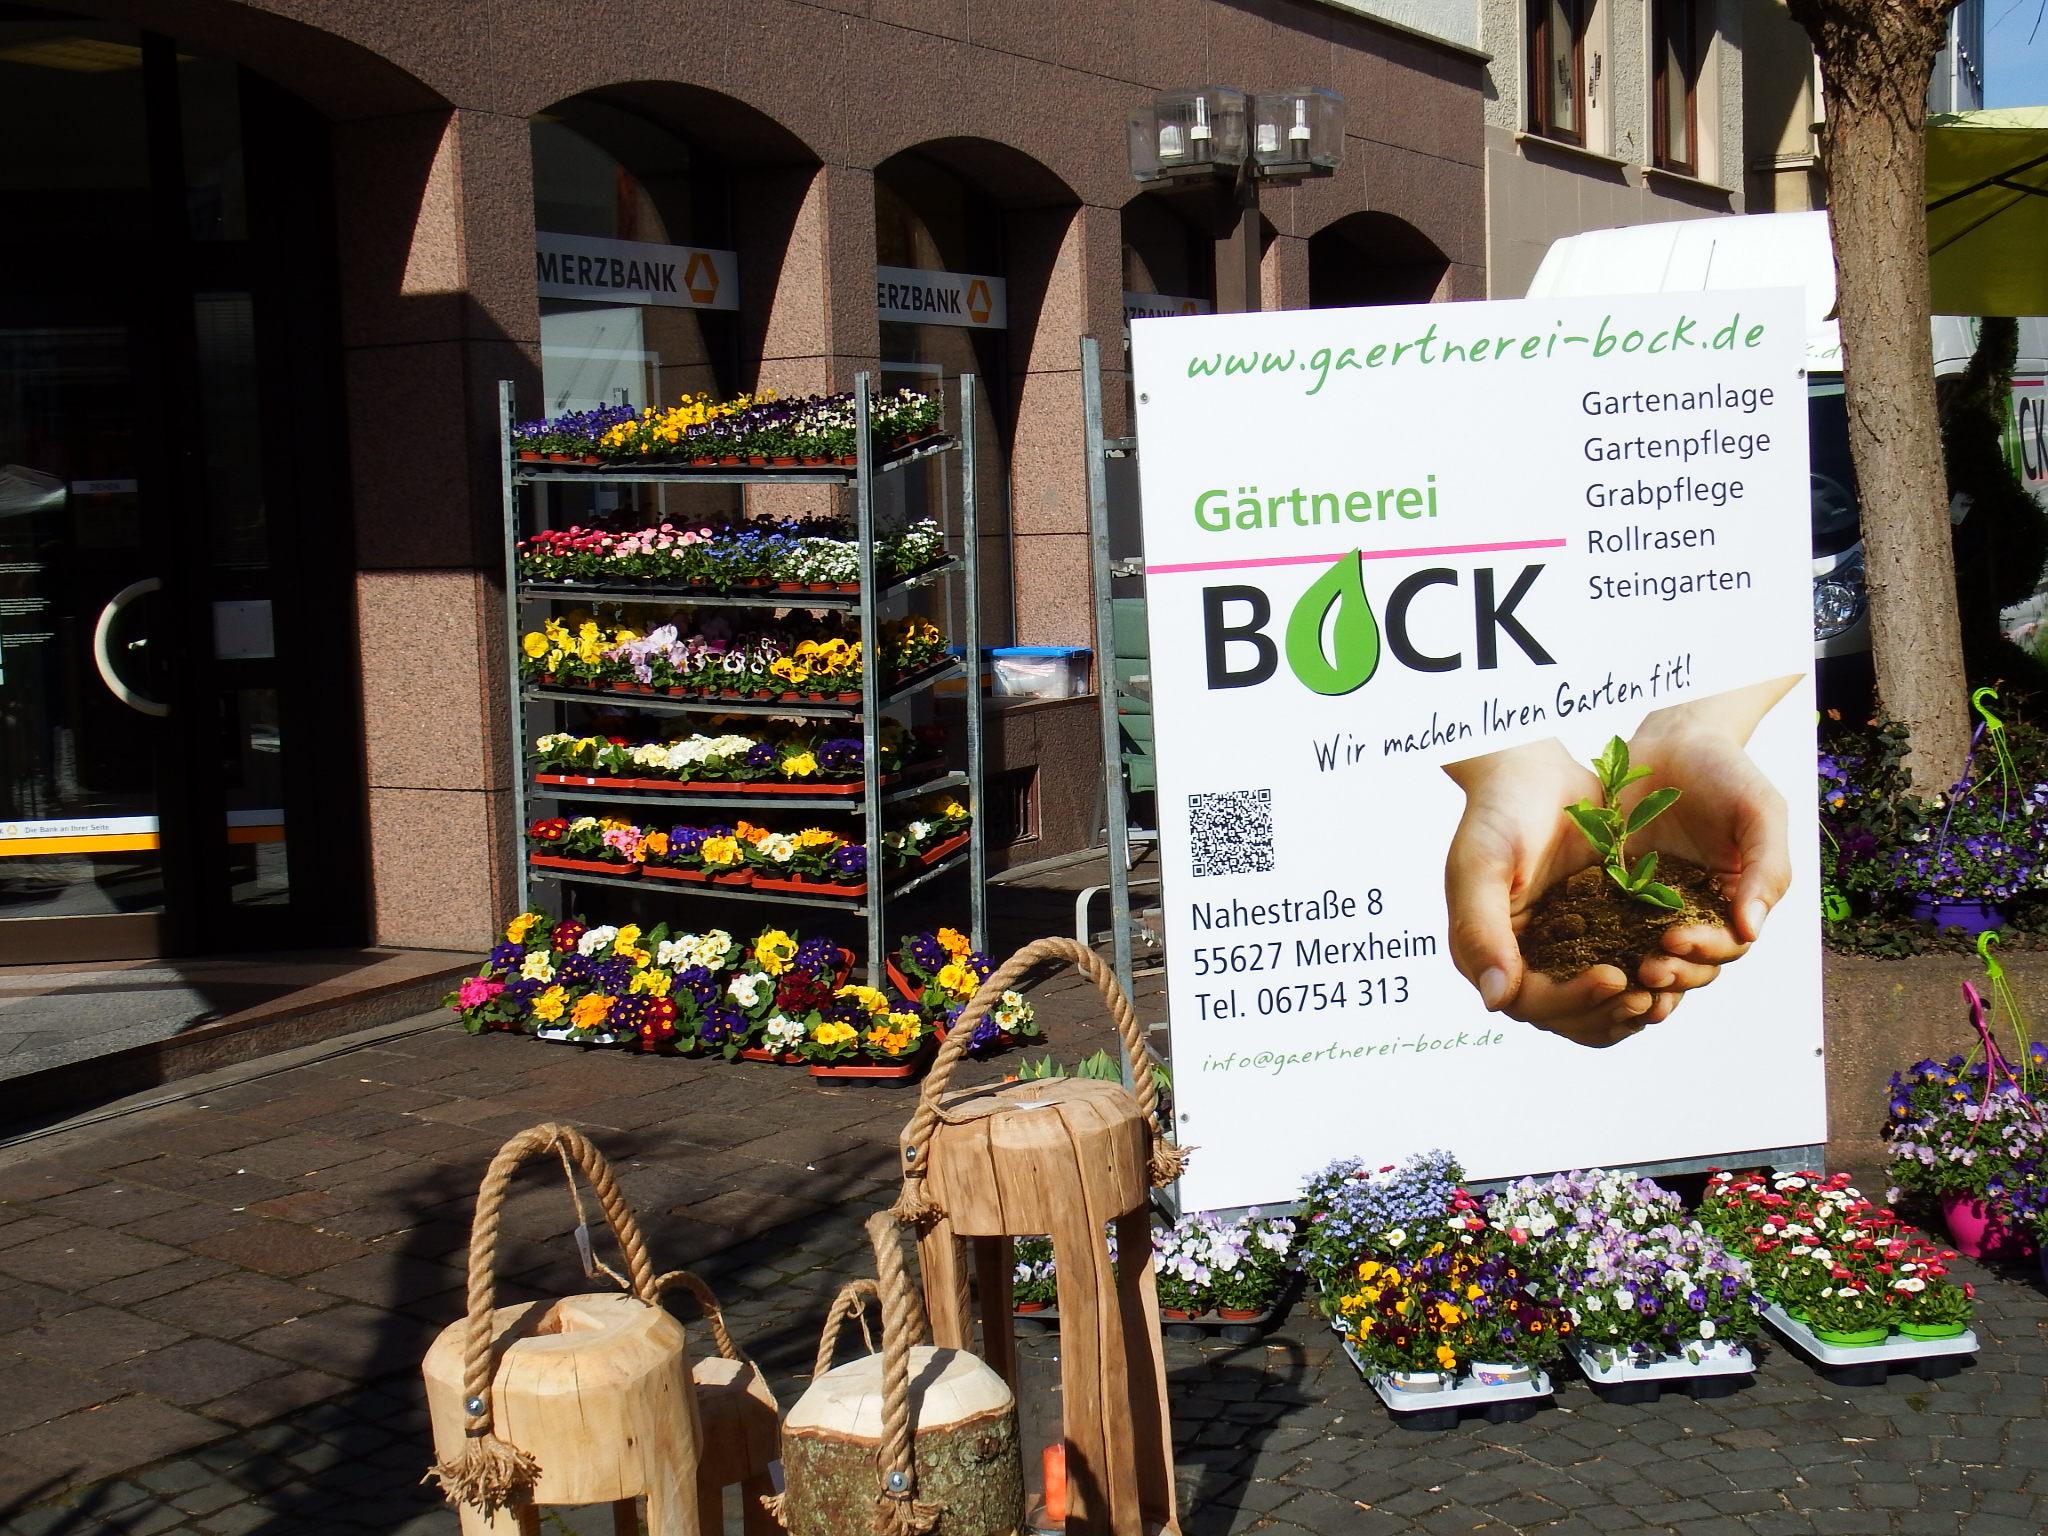 Frühlingserwachen - Angebot Gärtnerei Bock